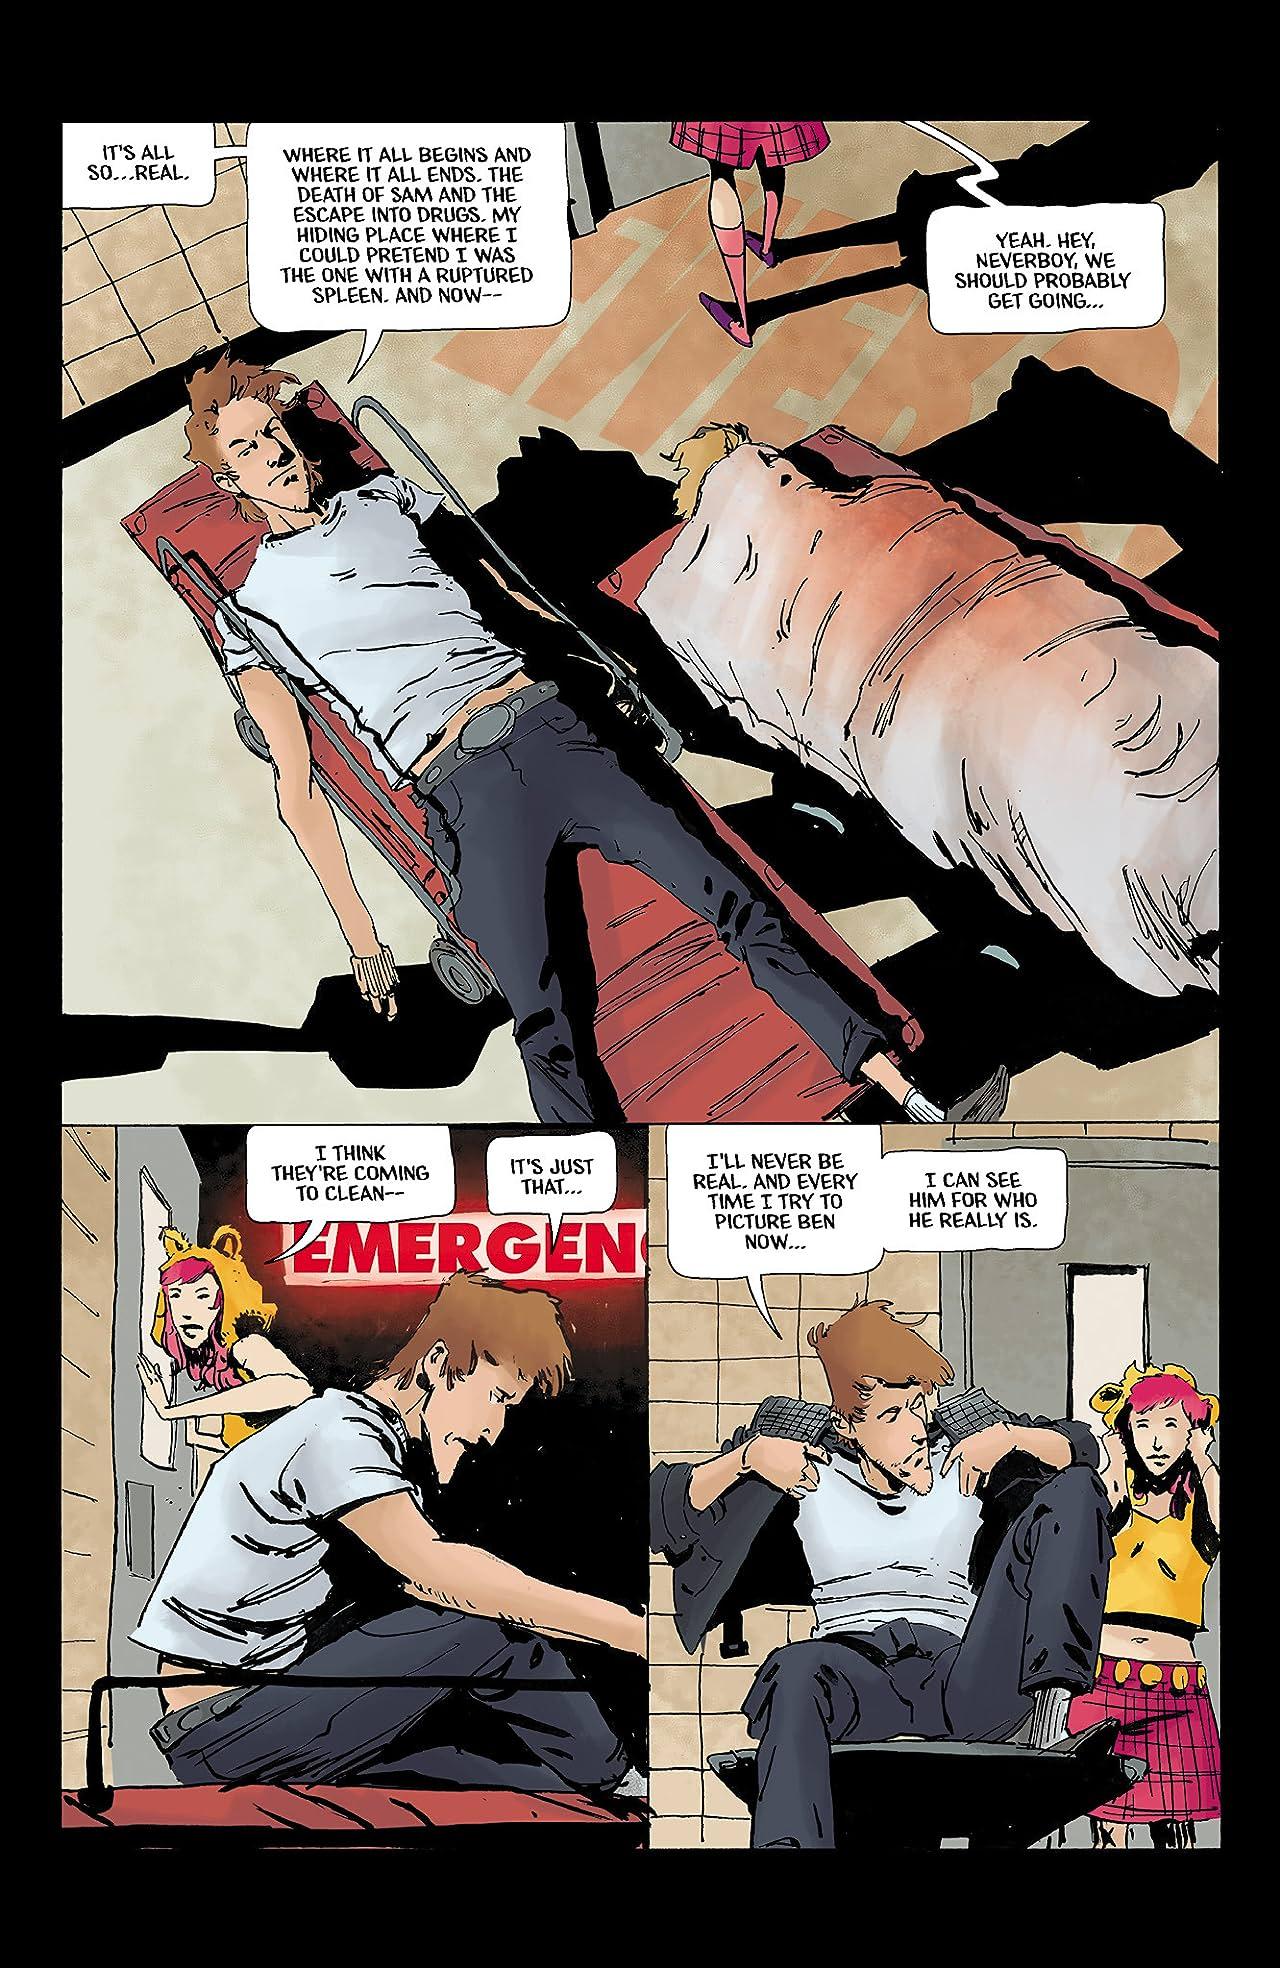 Neverboy #5